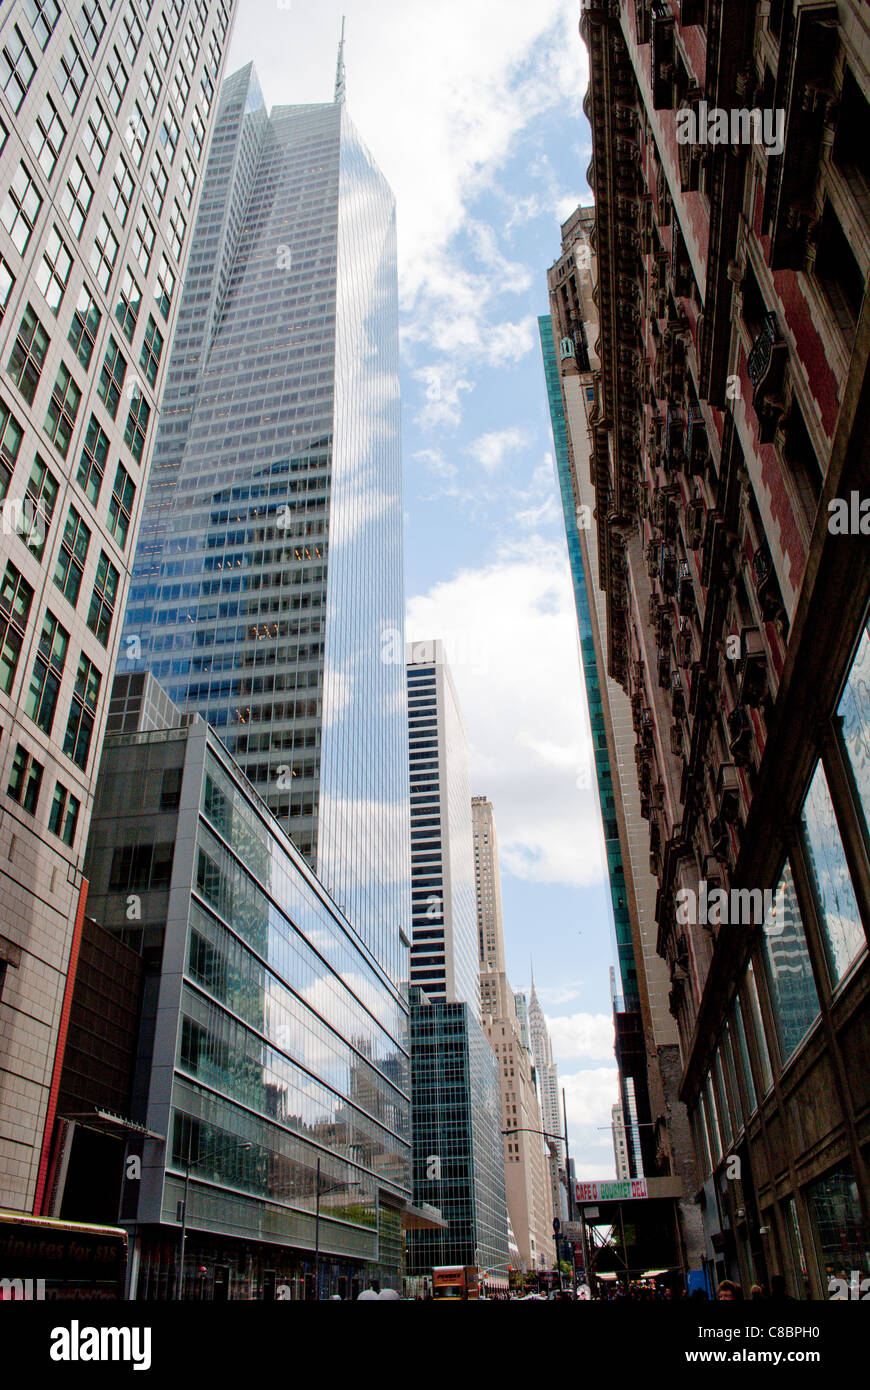 Street in New York City. - Stock Image